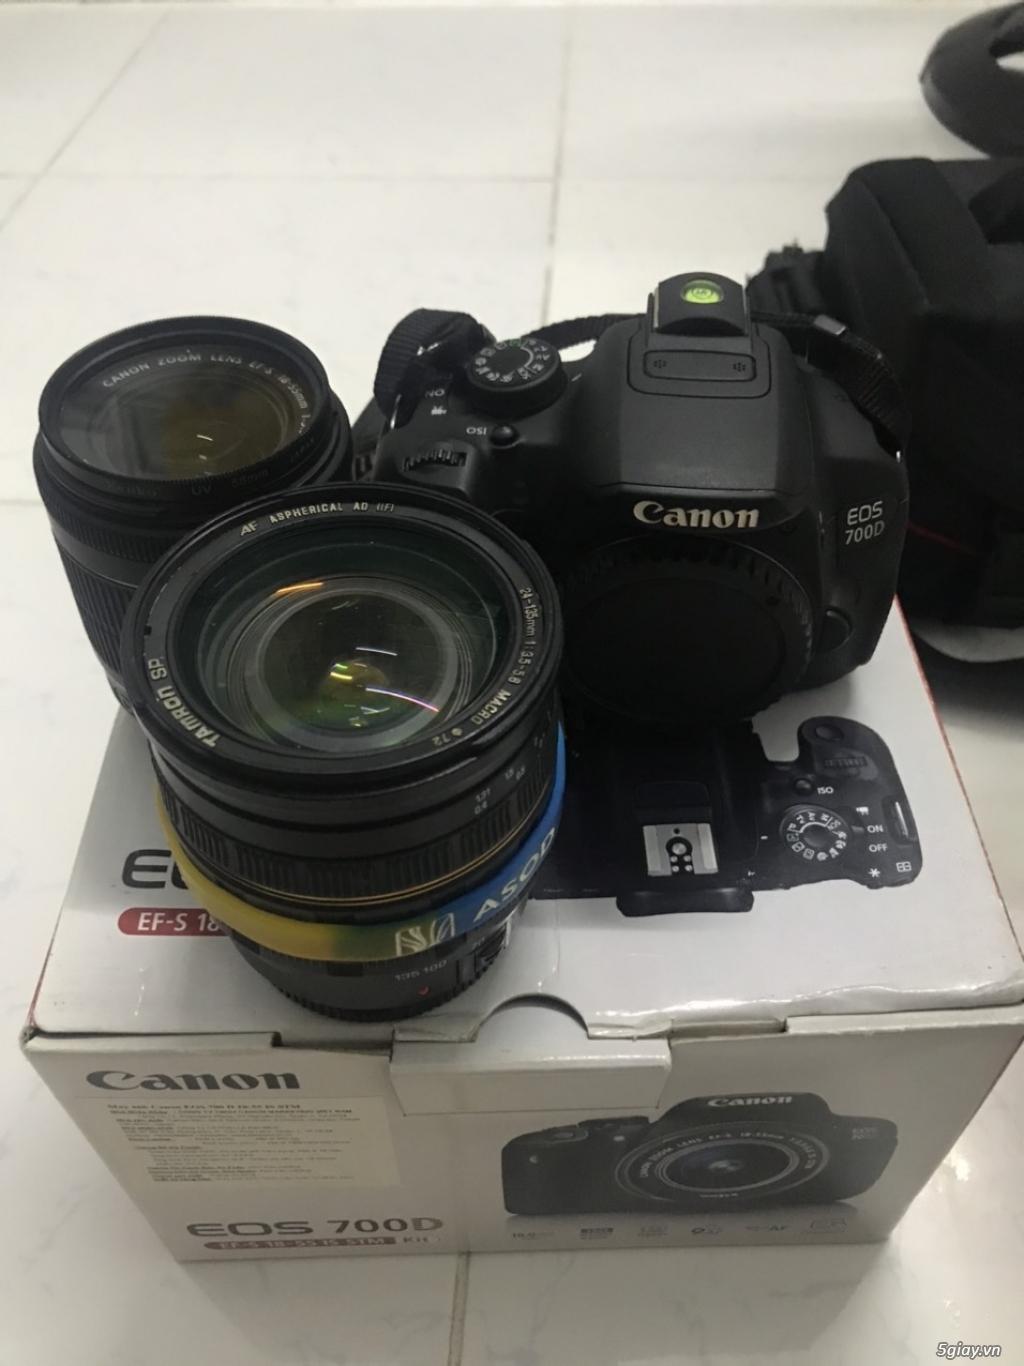 Cần bán Canon 700D + Lens kit 18-55 STM + Lens Tamron 24-135, full box